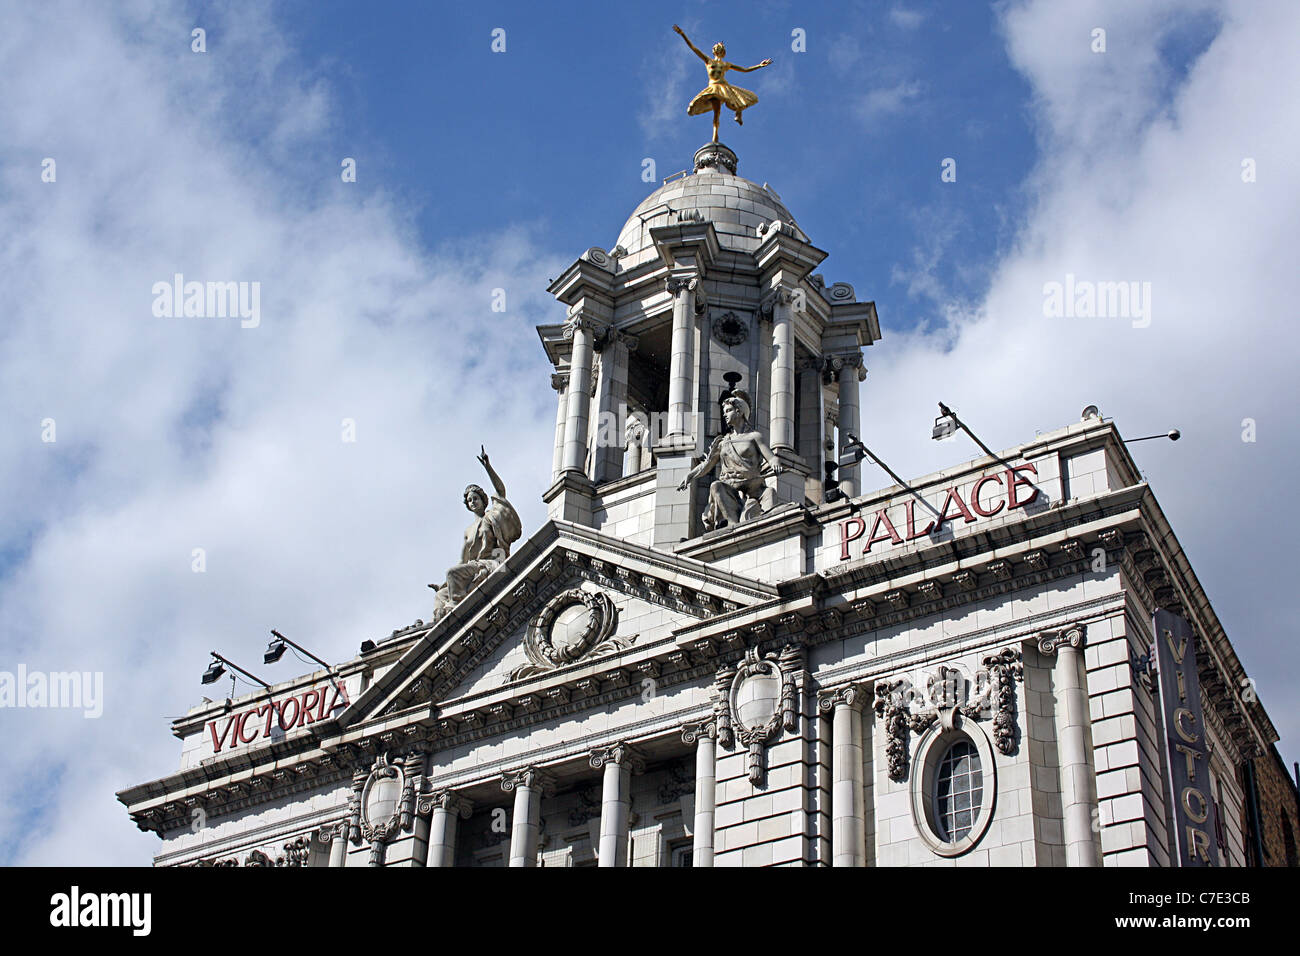 Victoria Palace Theatre, London, Frank Matcham. - Stock Image